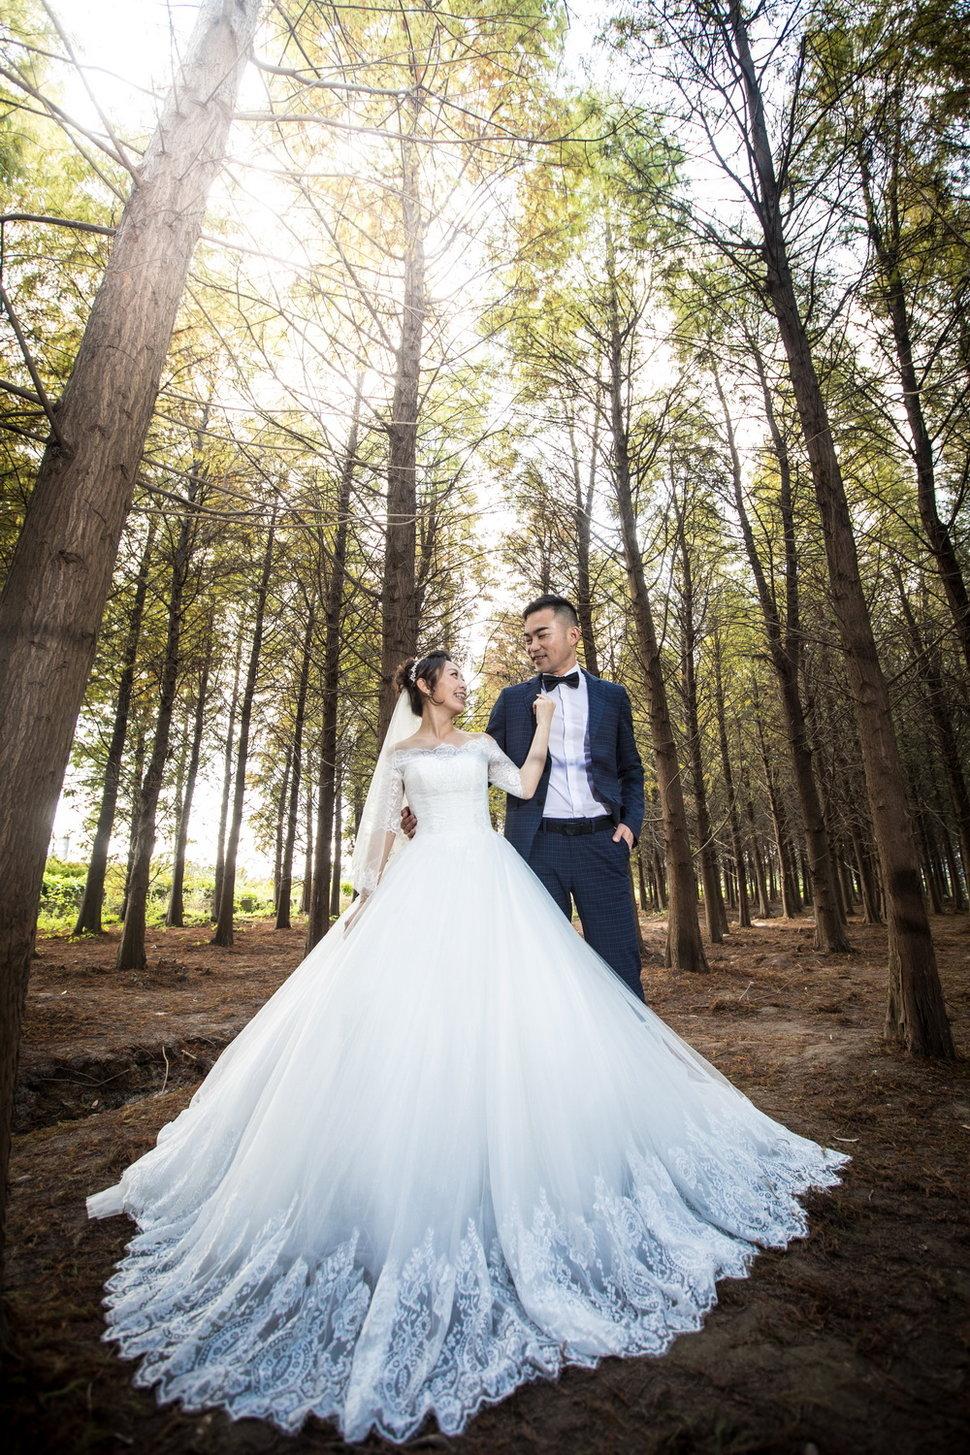 IMG_8772 - 春之嫁衣精緻婚紗 - 結婚吧